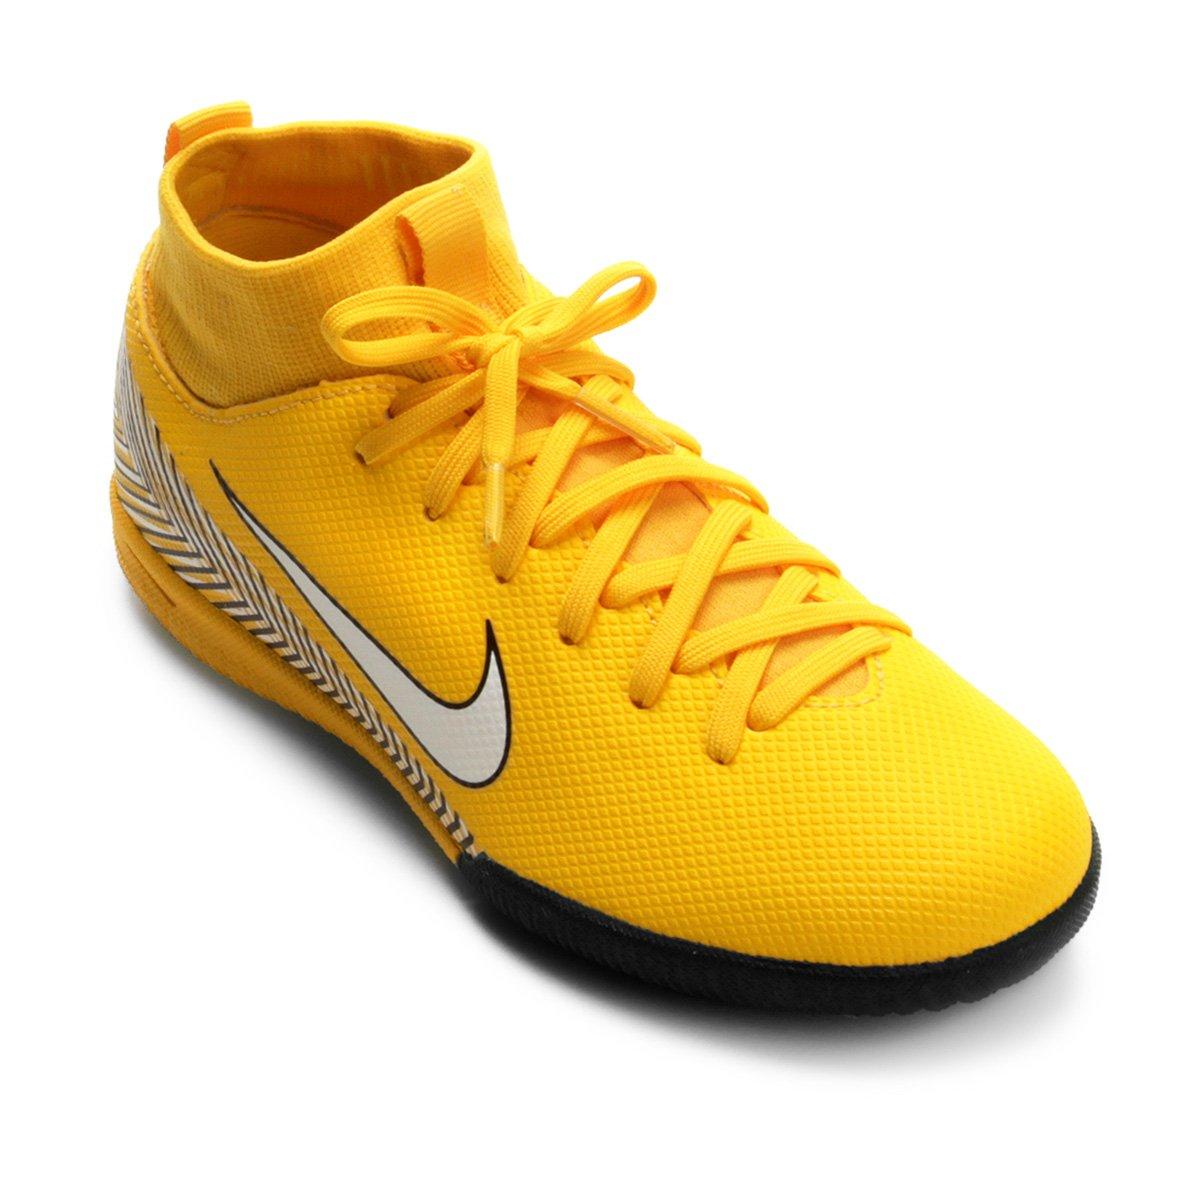 bb44a320b5 Chuteira Futsal Infantil Nike Mercurial Superfly 6 Academy - Amarelo ...